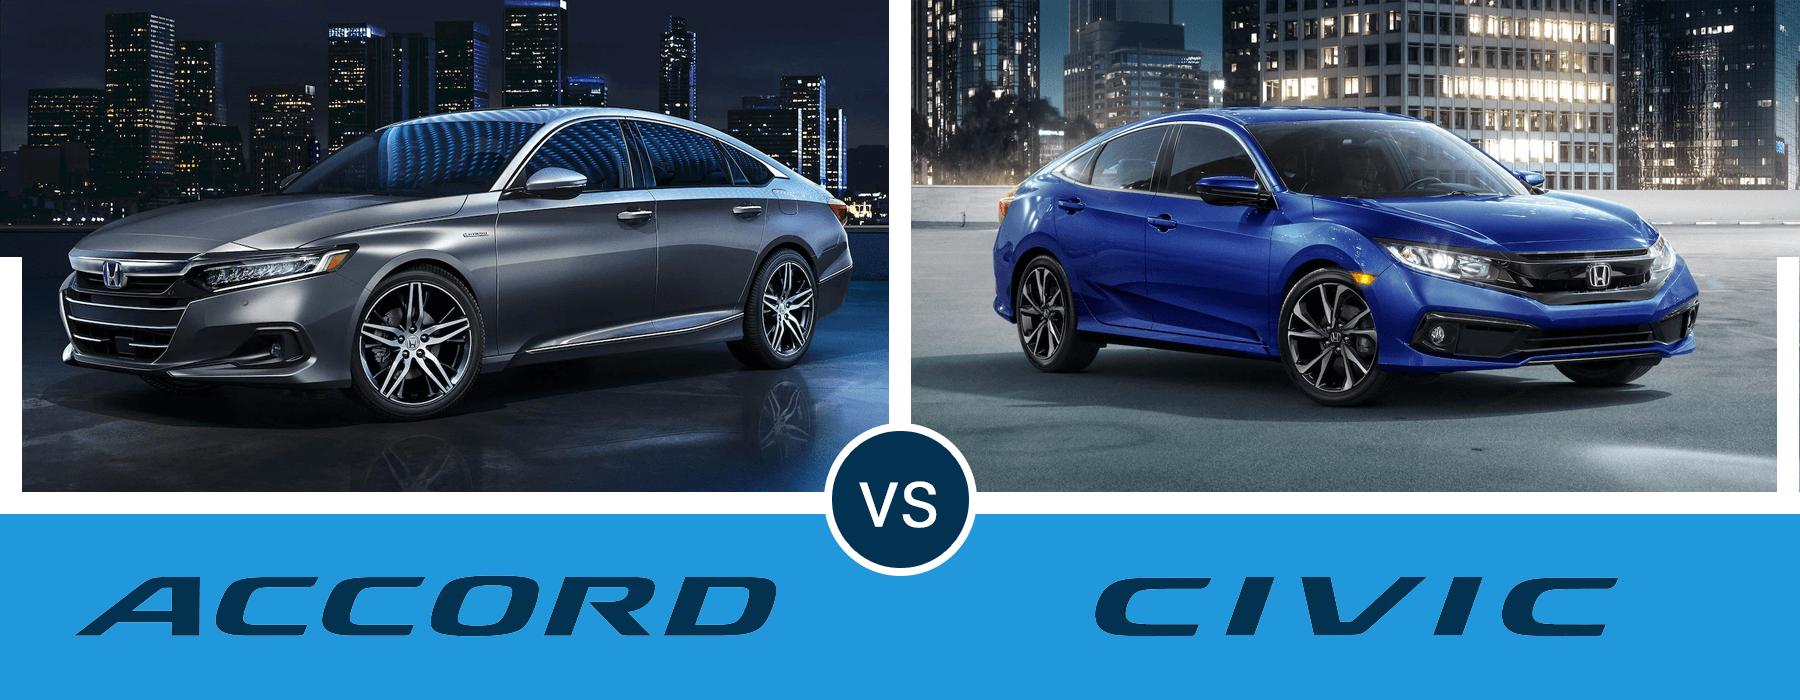 Honda Accord Versus Honda Civic Slider